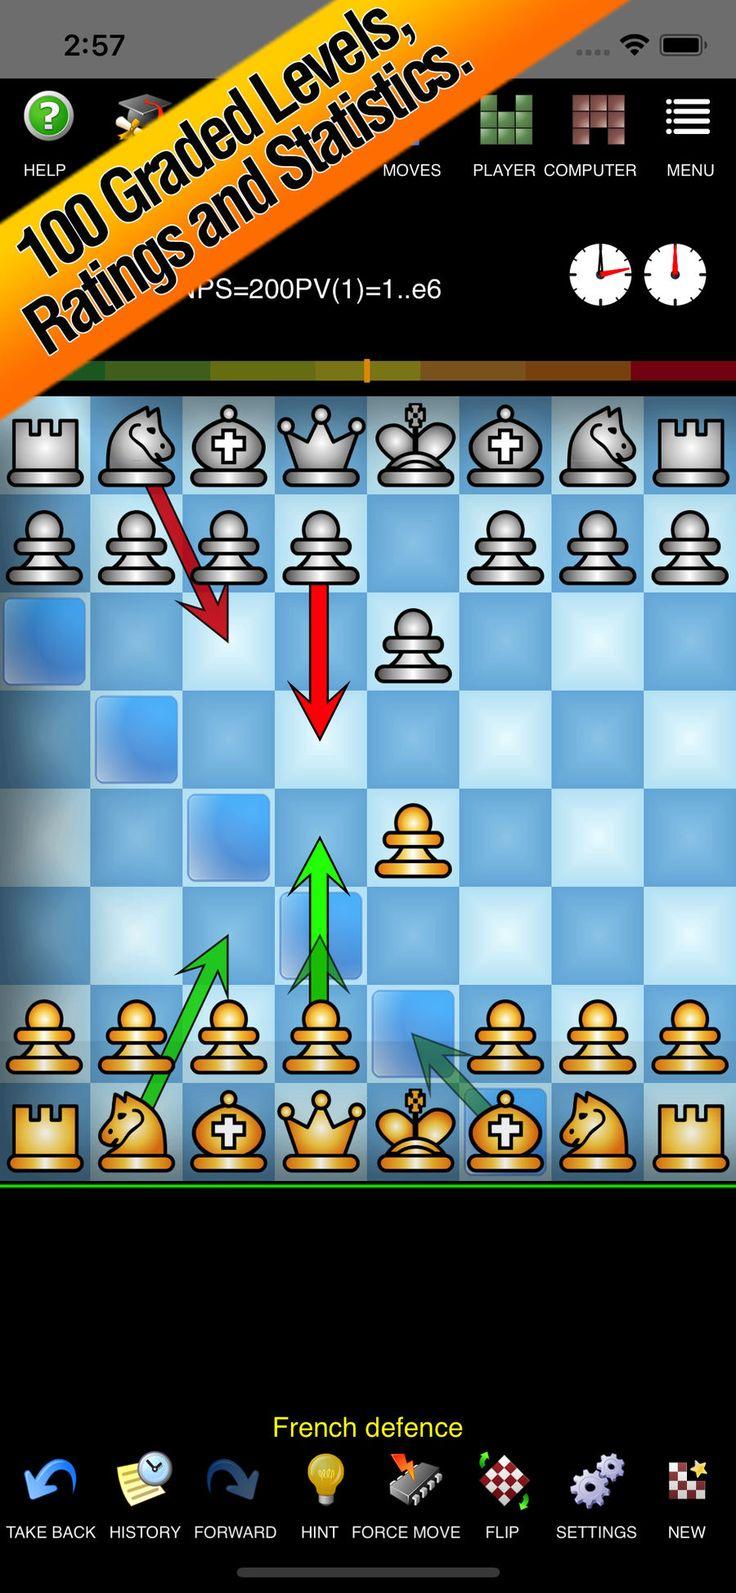 Chess play friends online3d strategygamesboardios